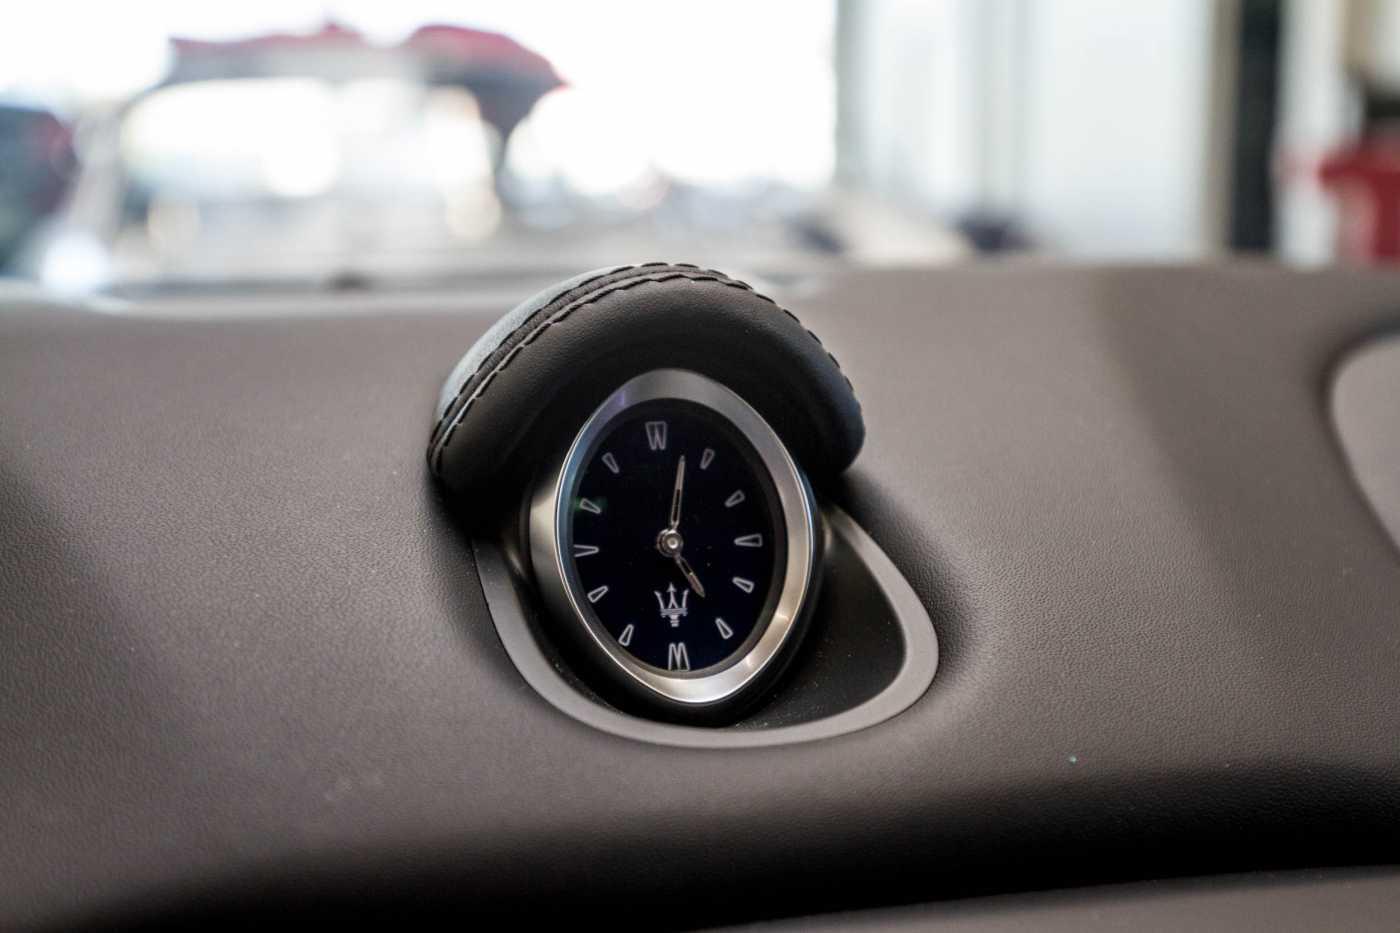 Maserati Ghibli Diesel GranLusso Keyless Sports Exhaust LED Camera 29/29